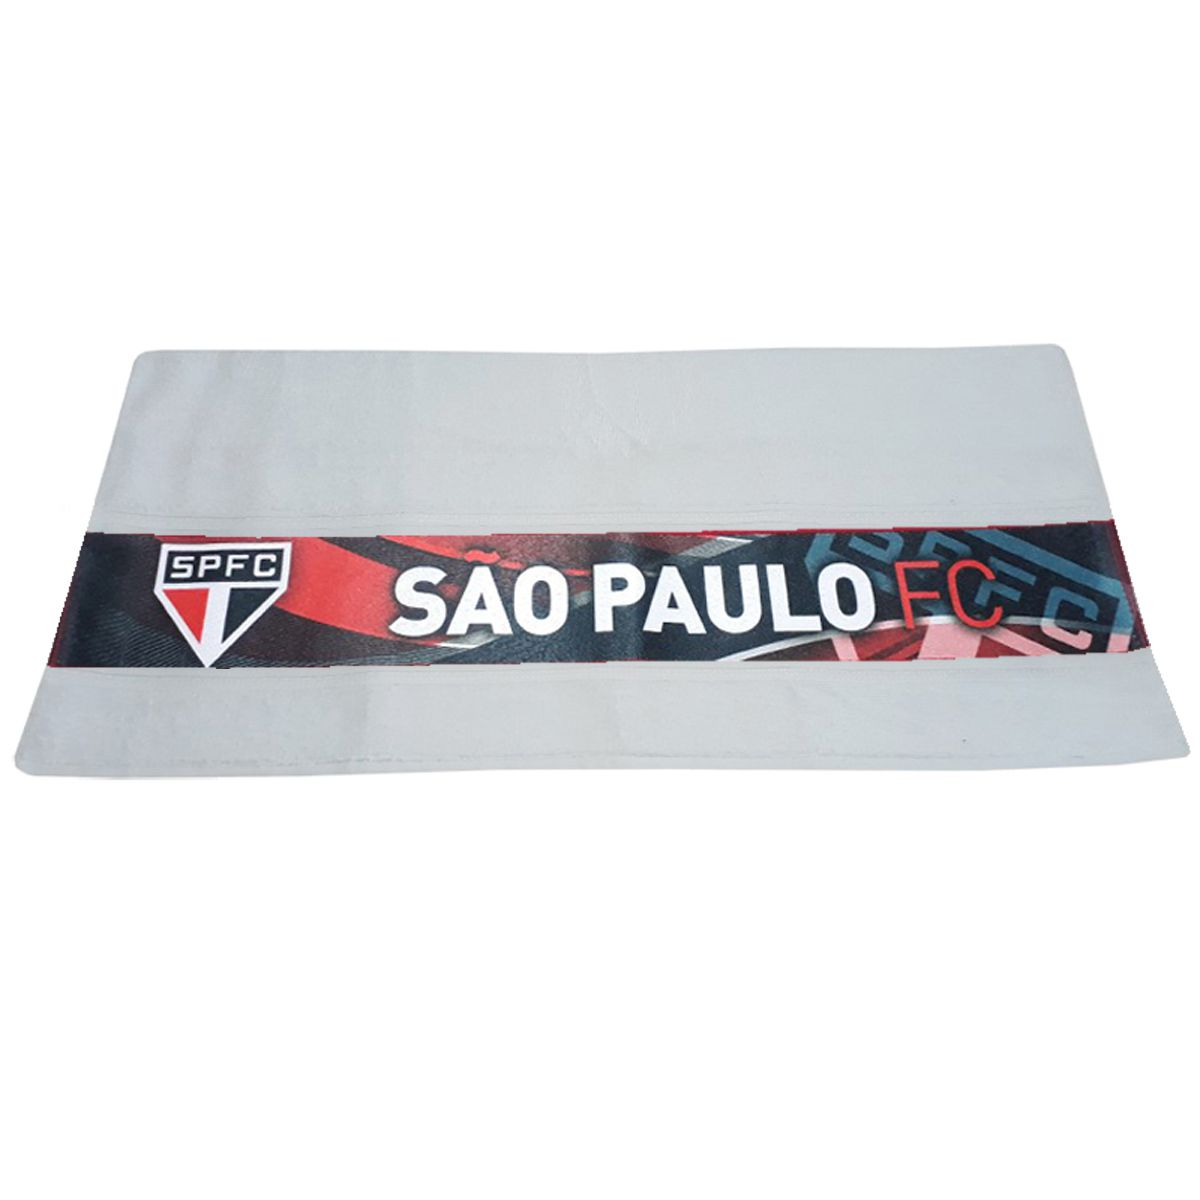 Toalha do São Paulo Transfer Buettner Bouton - 45028